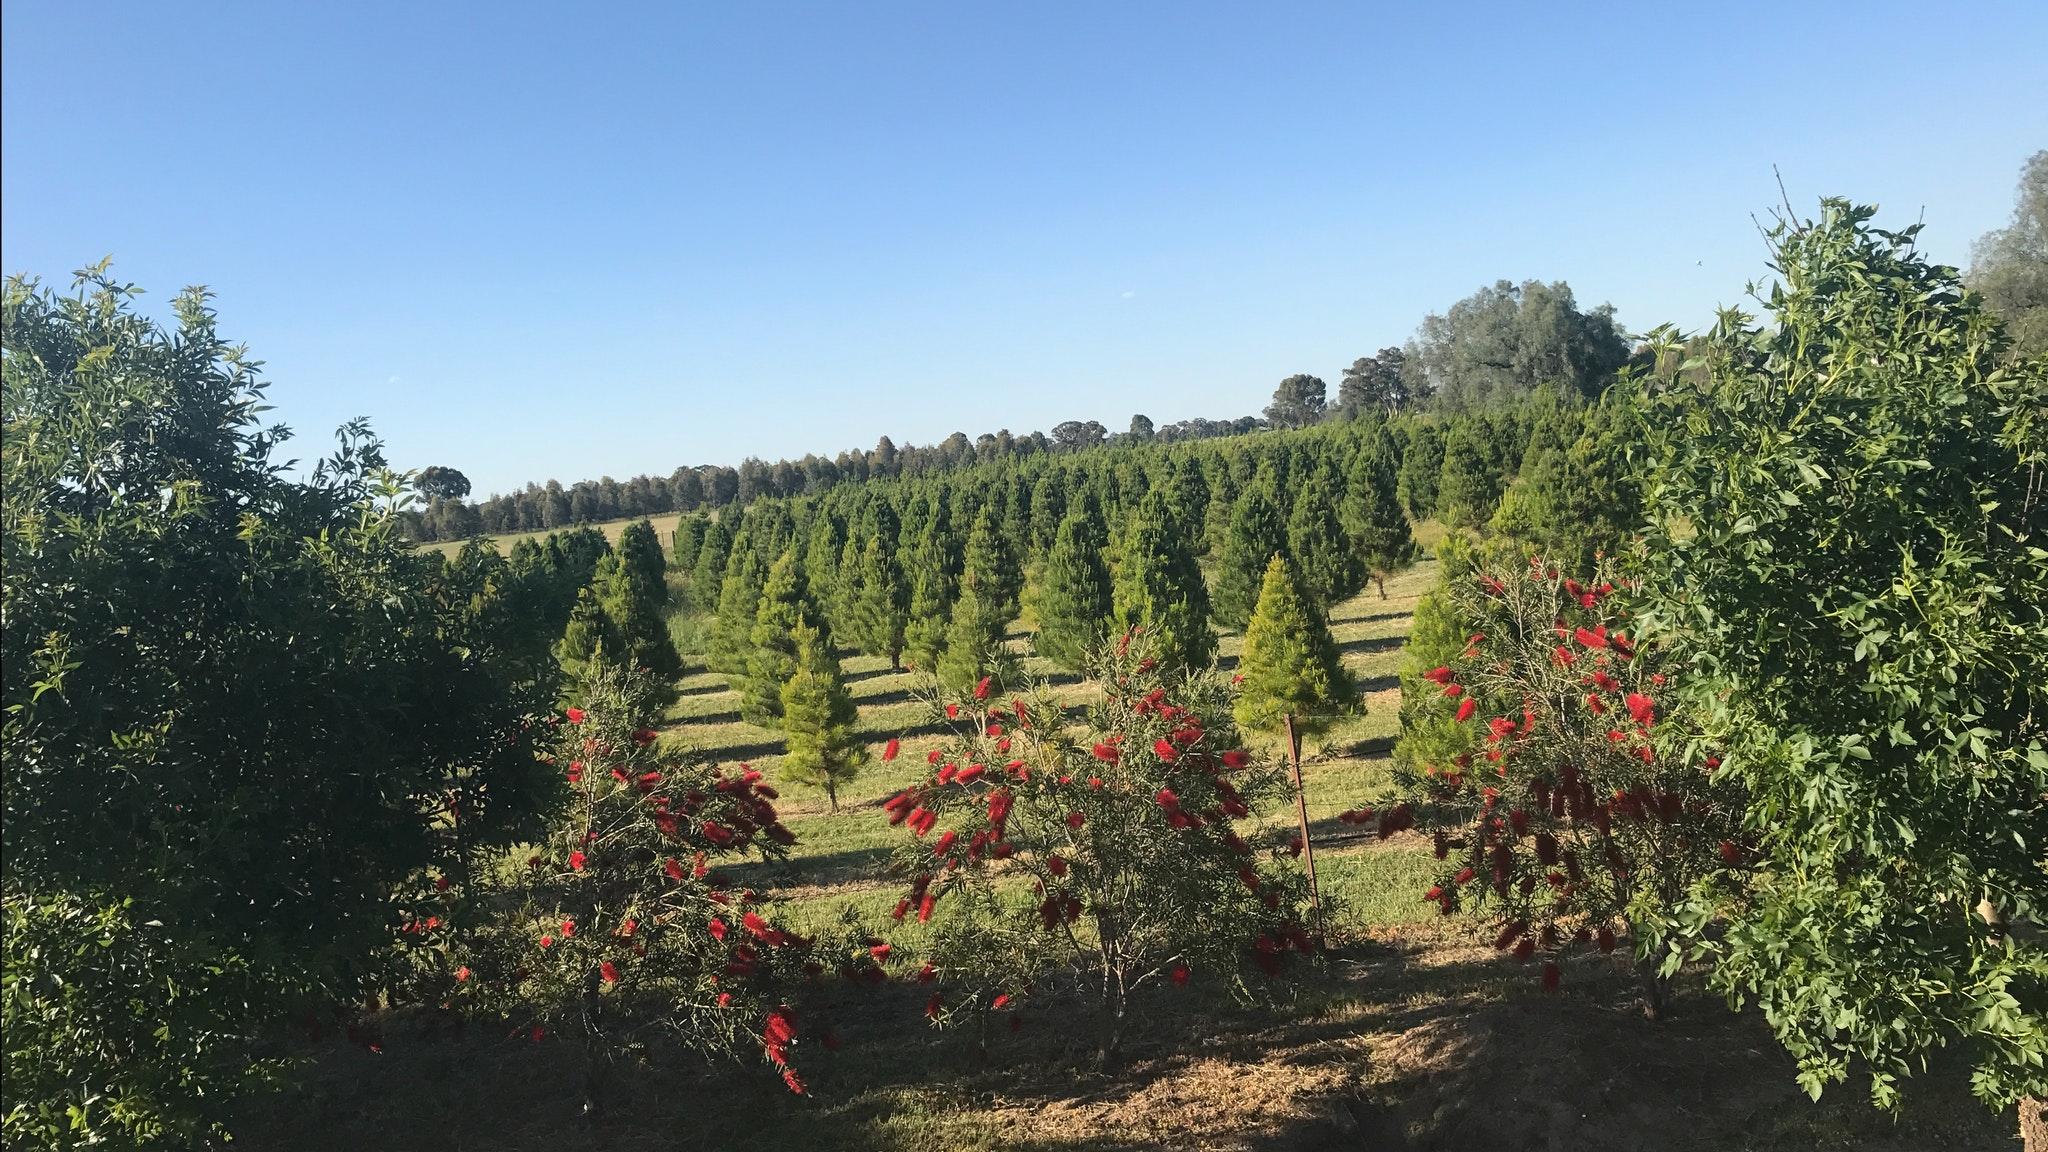 Rutherglen Christmas Trees Farm Stay